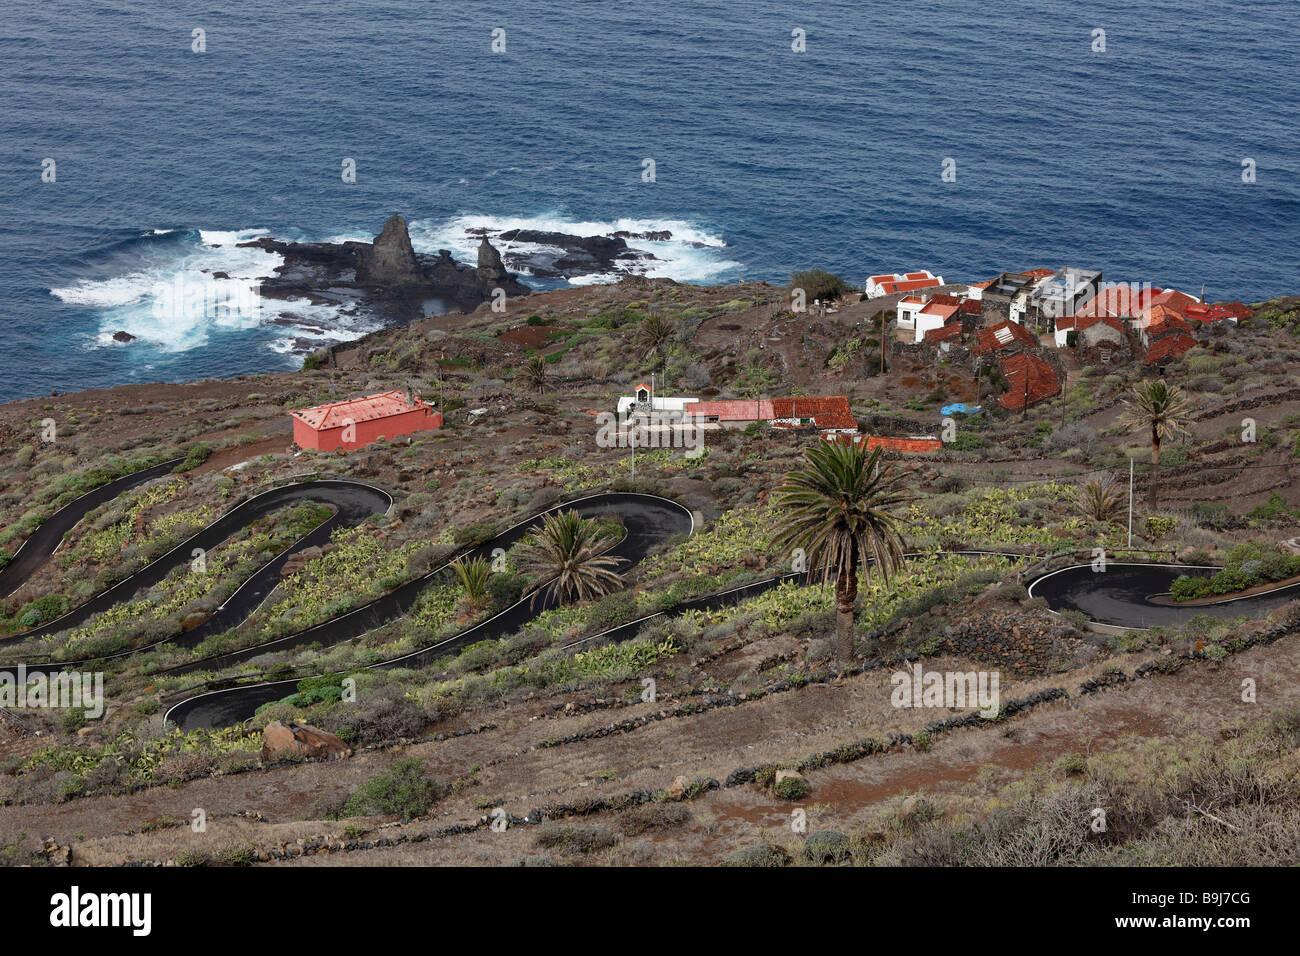 Rocks near Arguamul, Roques de Arguamul, Guillama settlement, La Gomera, Canaries, Canary Islands, Spain, Europe - Stock Image